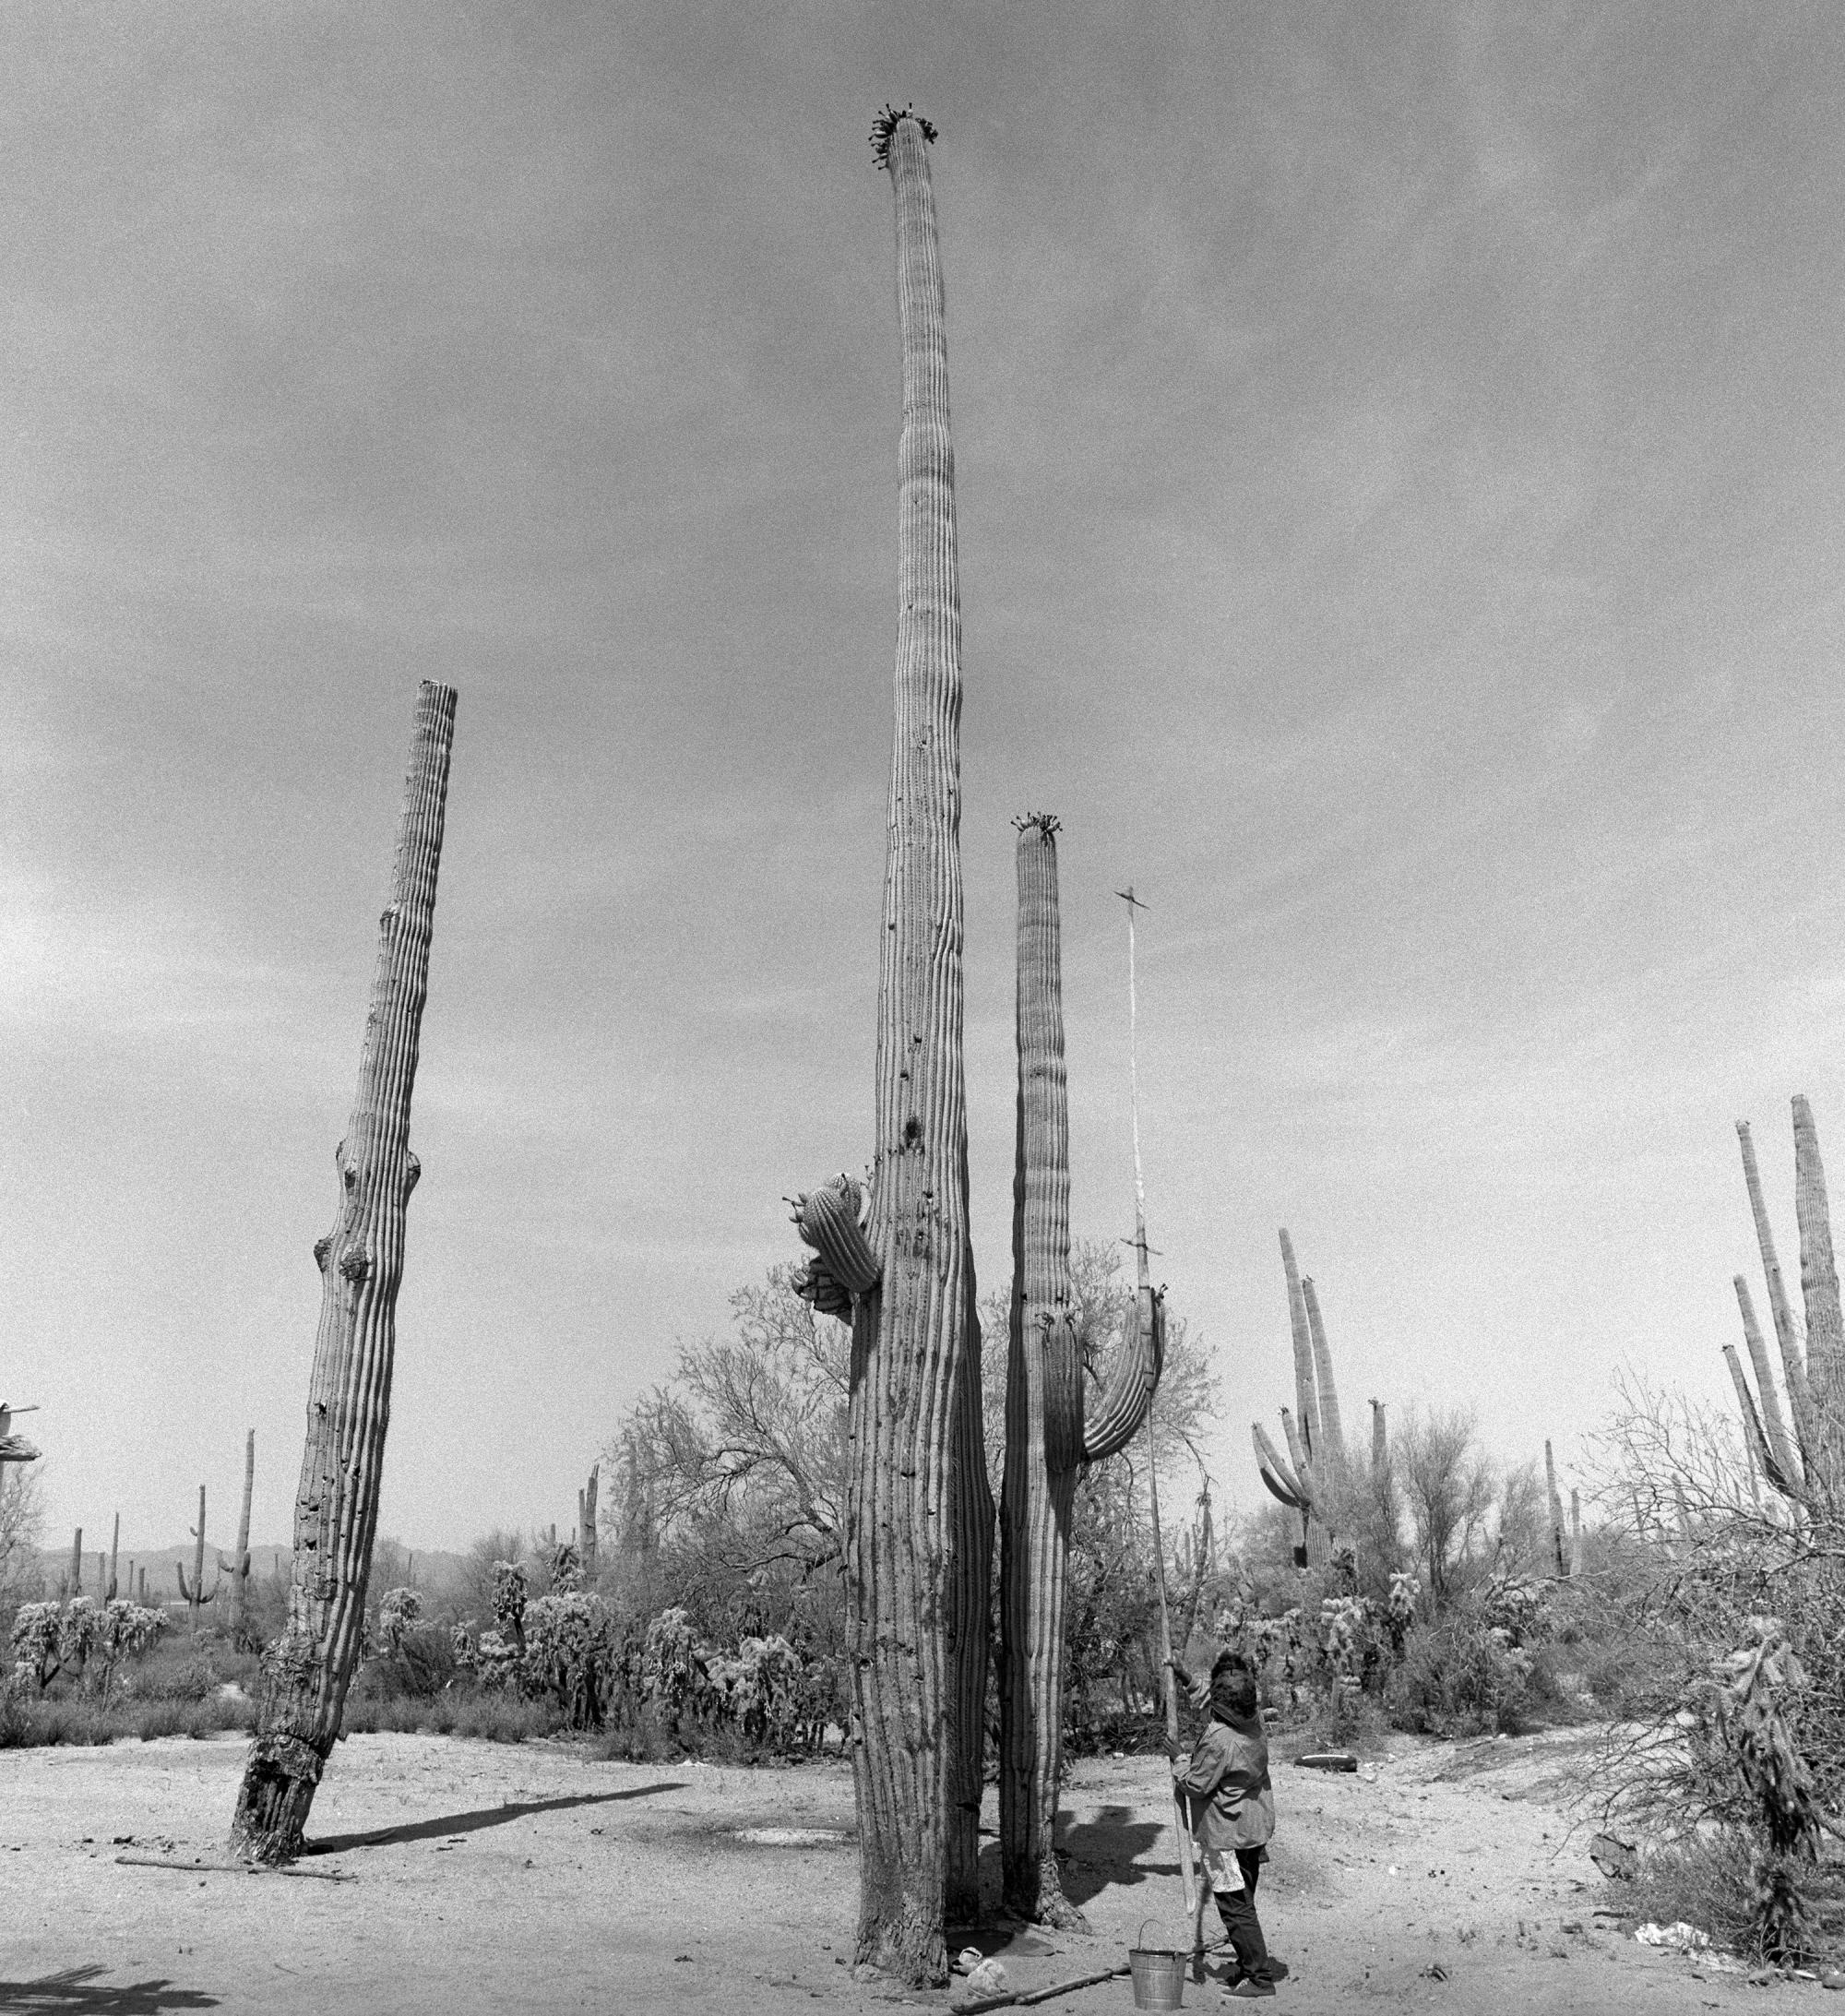 Helga Teiwes took this 1970 image of Juanita Ahill collecting saguaro fruit in the Saguaro National Park West.